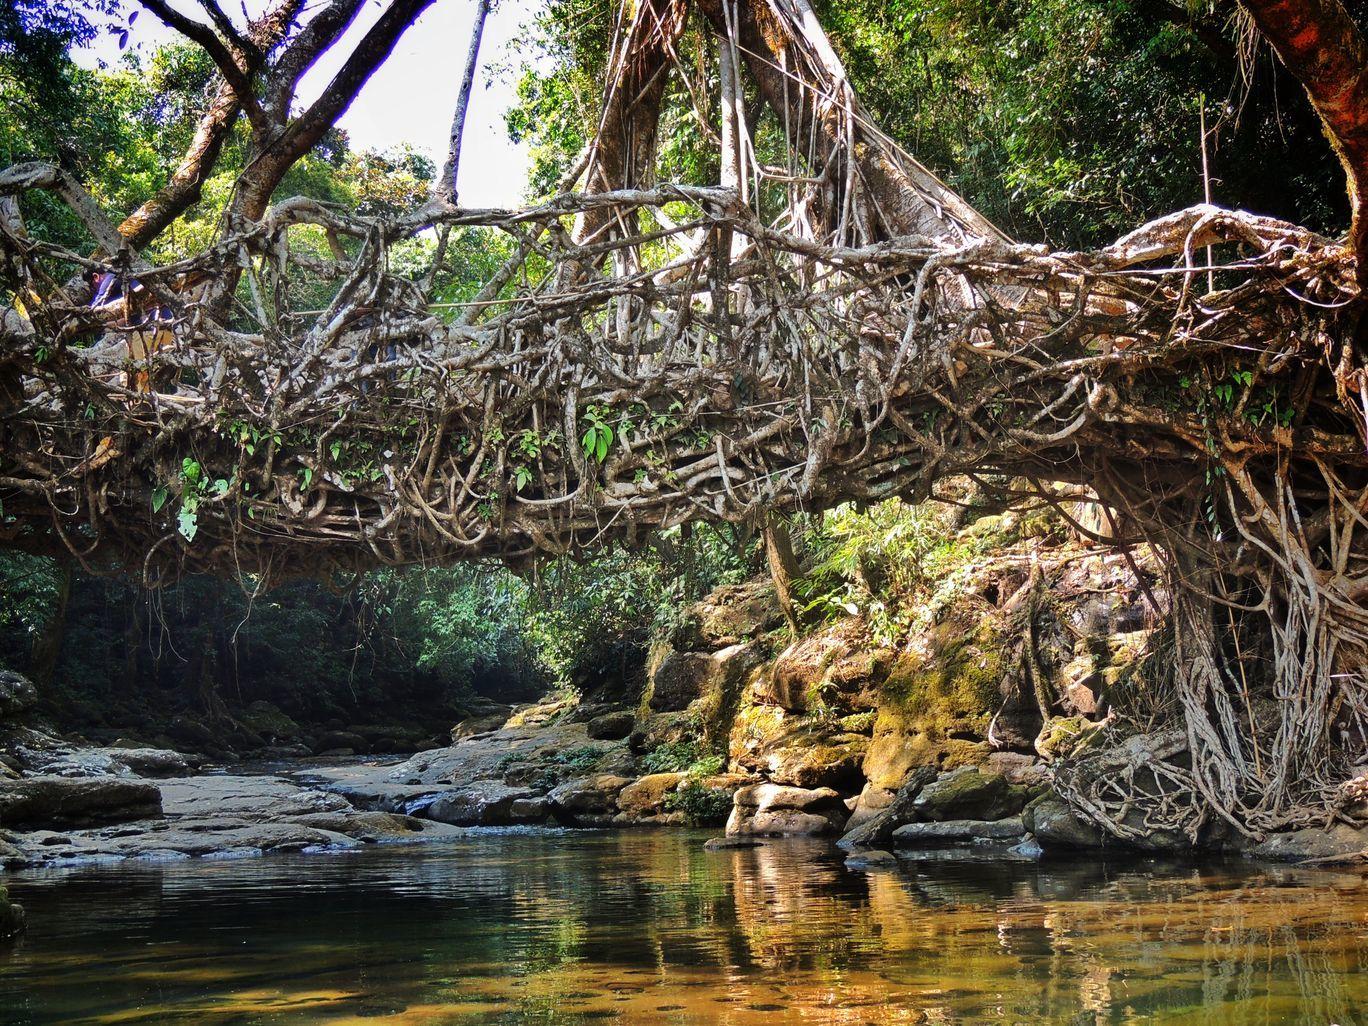 Photo of Living Root Bridge By pshrutika